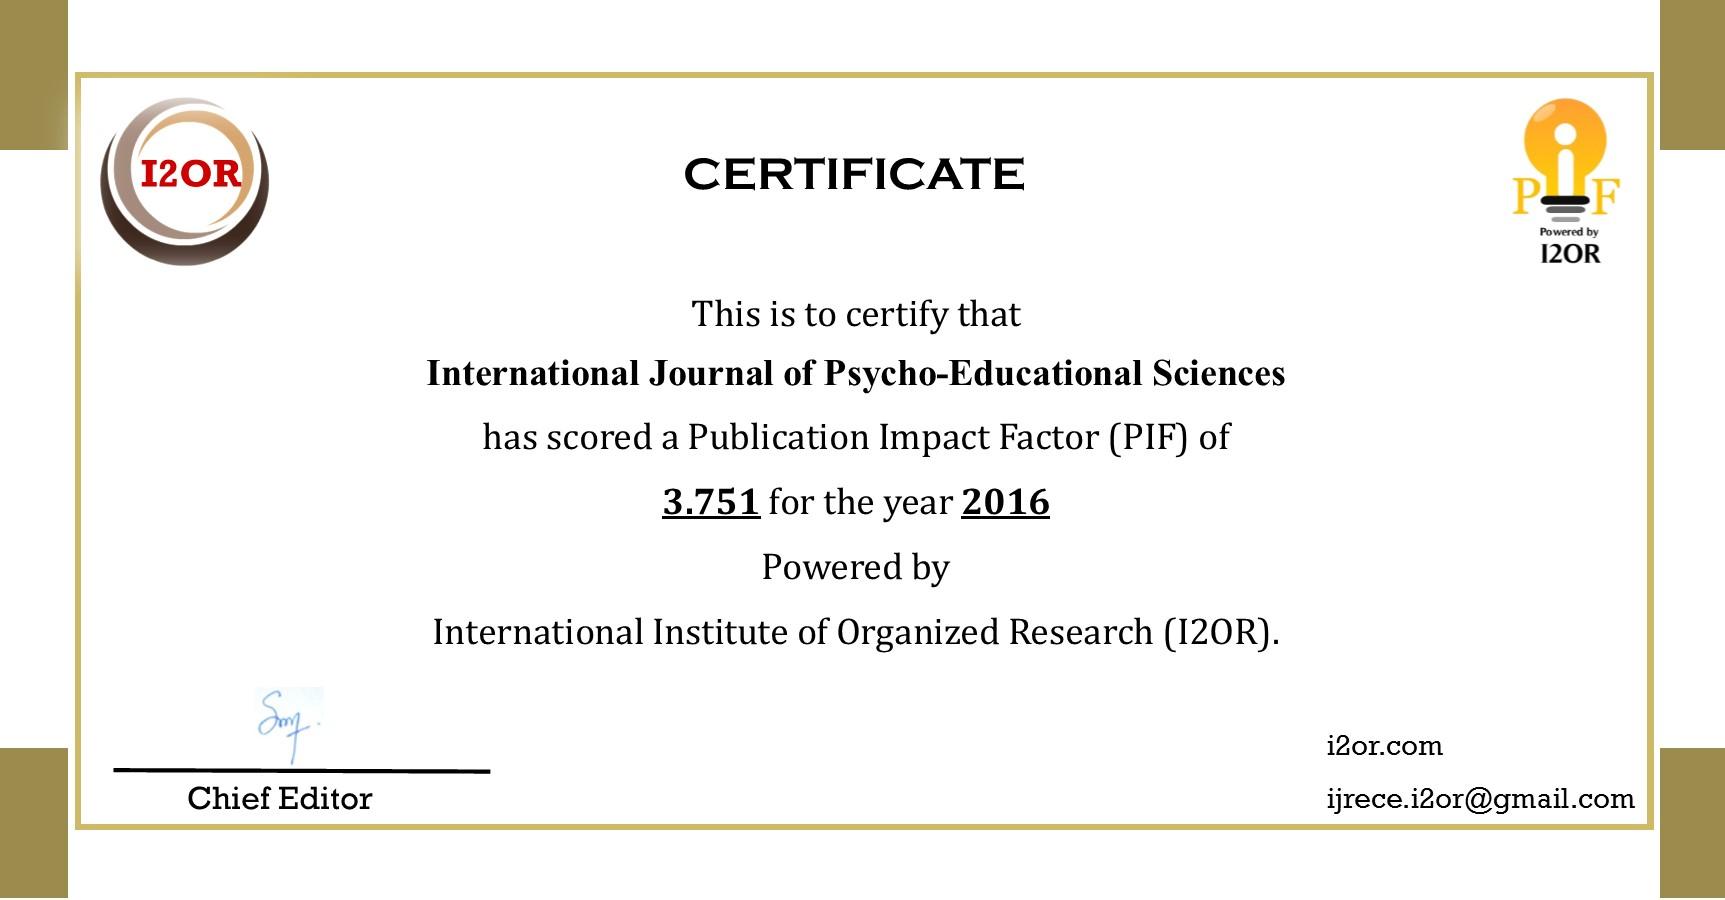 International-Journal-of-Psycho-Educational-Sciences-certificate-2016